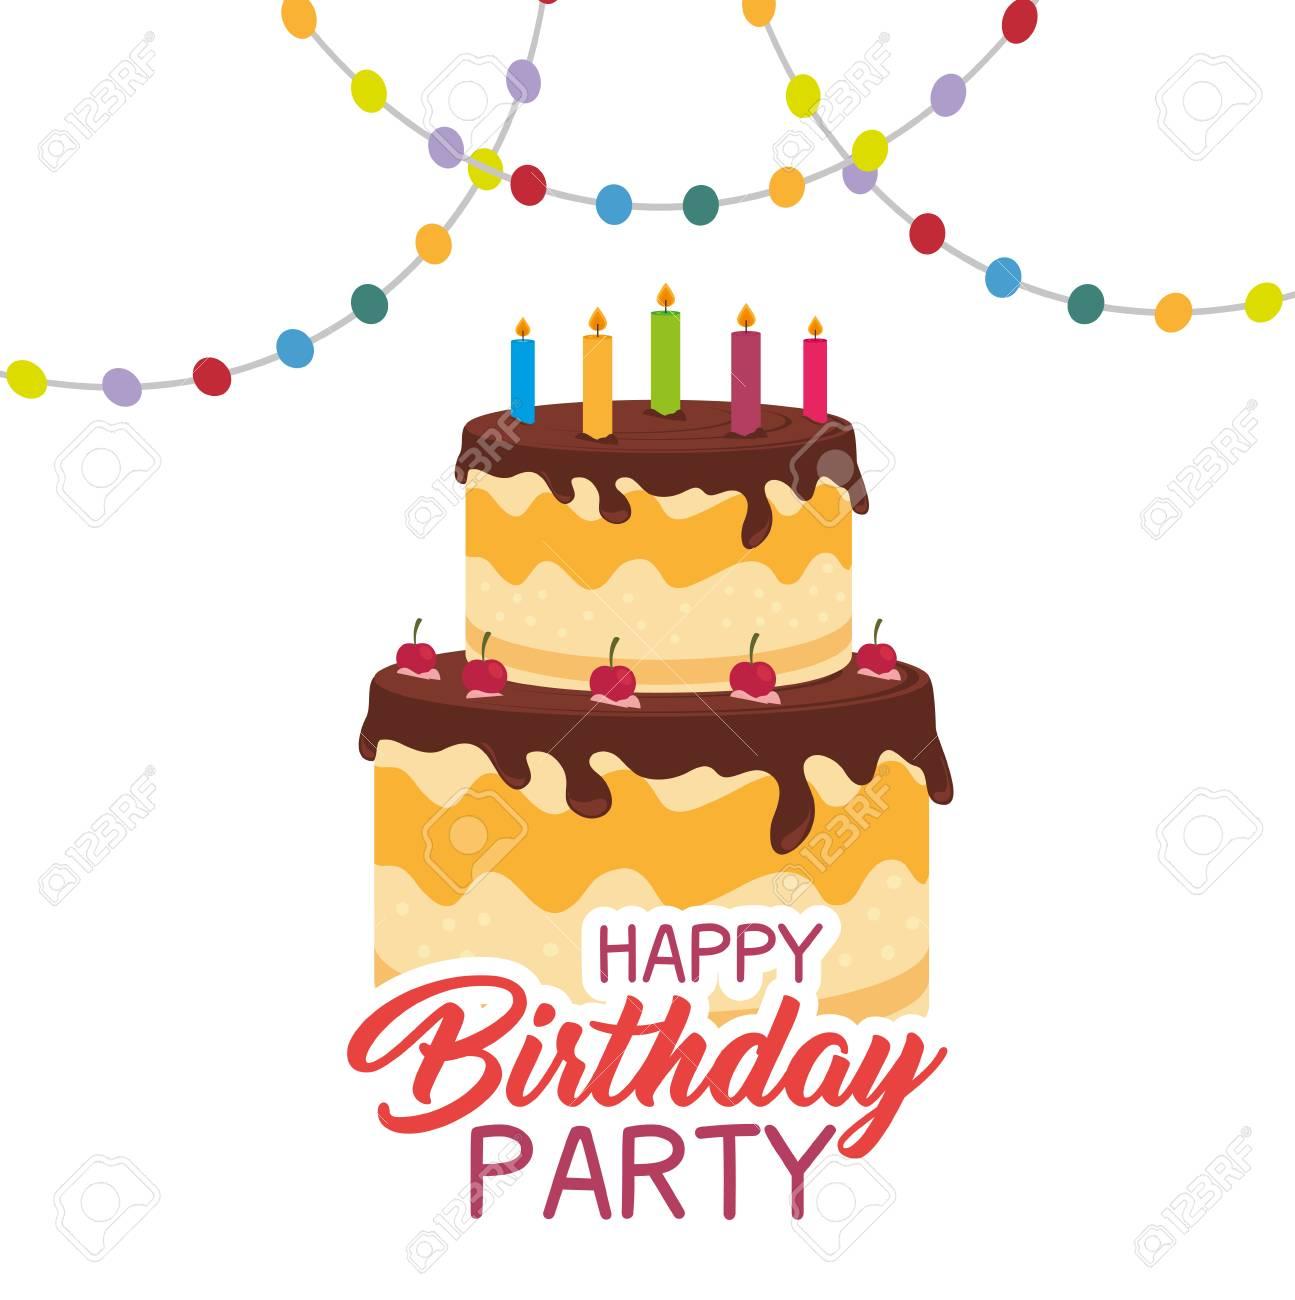 Happy Birthday Cake Card Vector Illustration Design